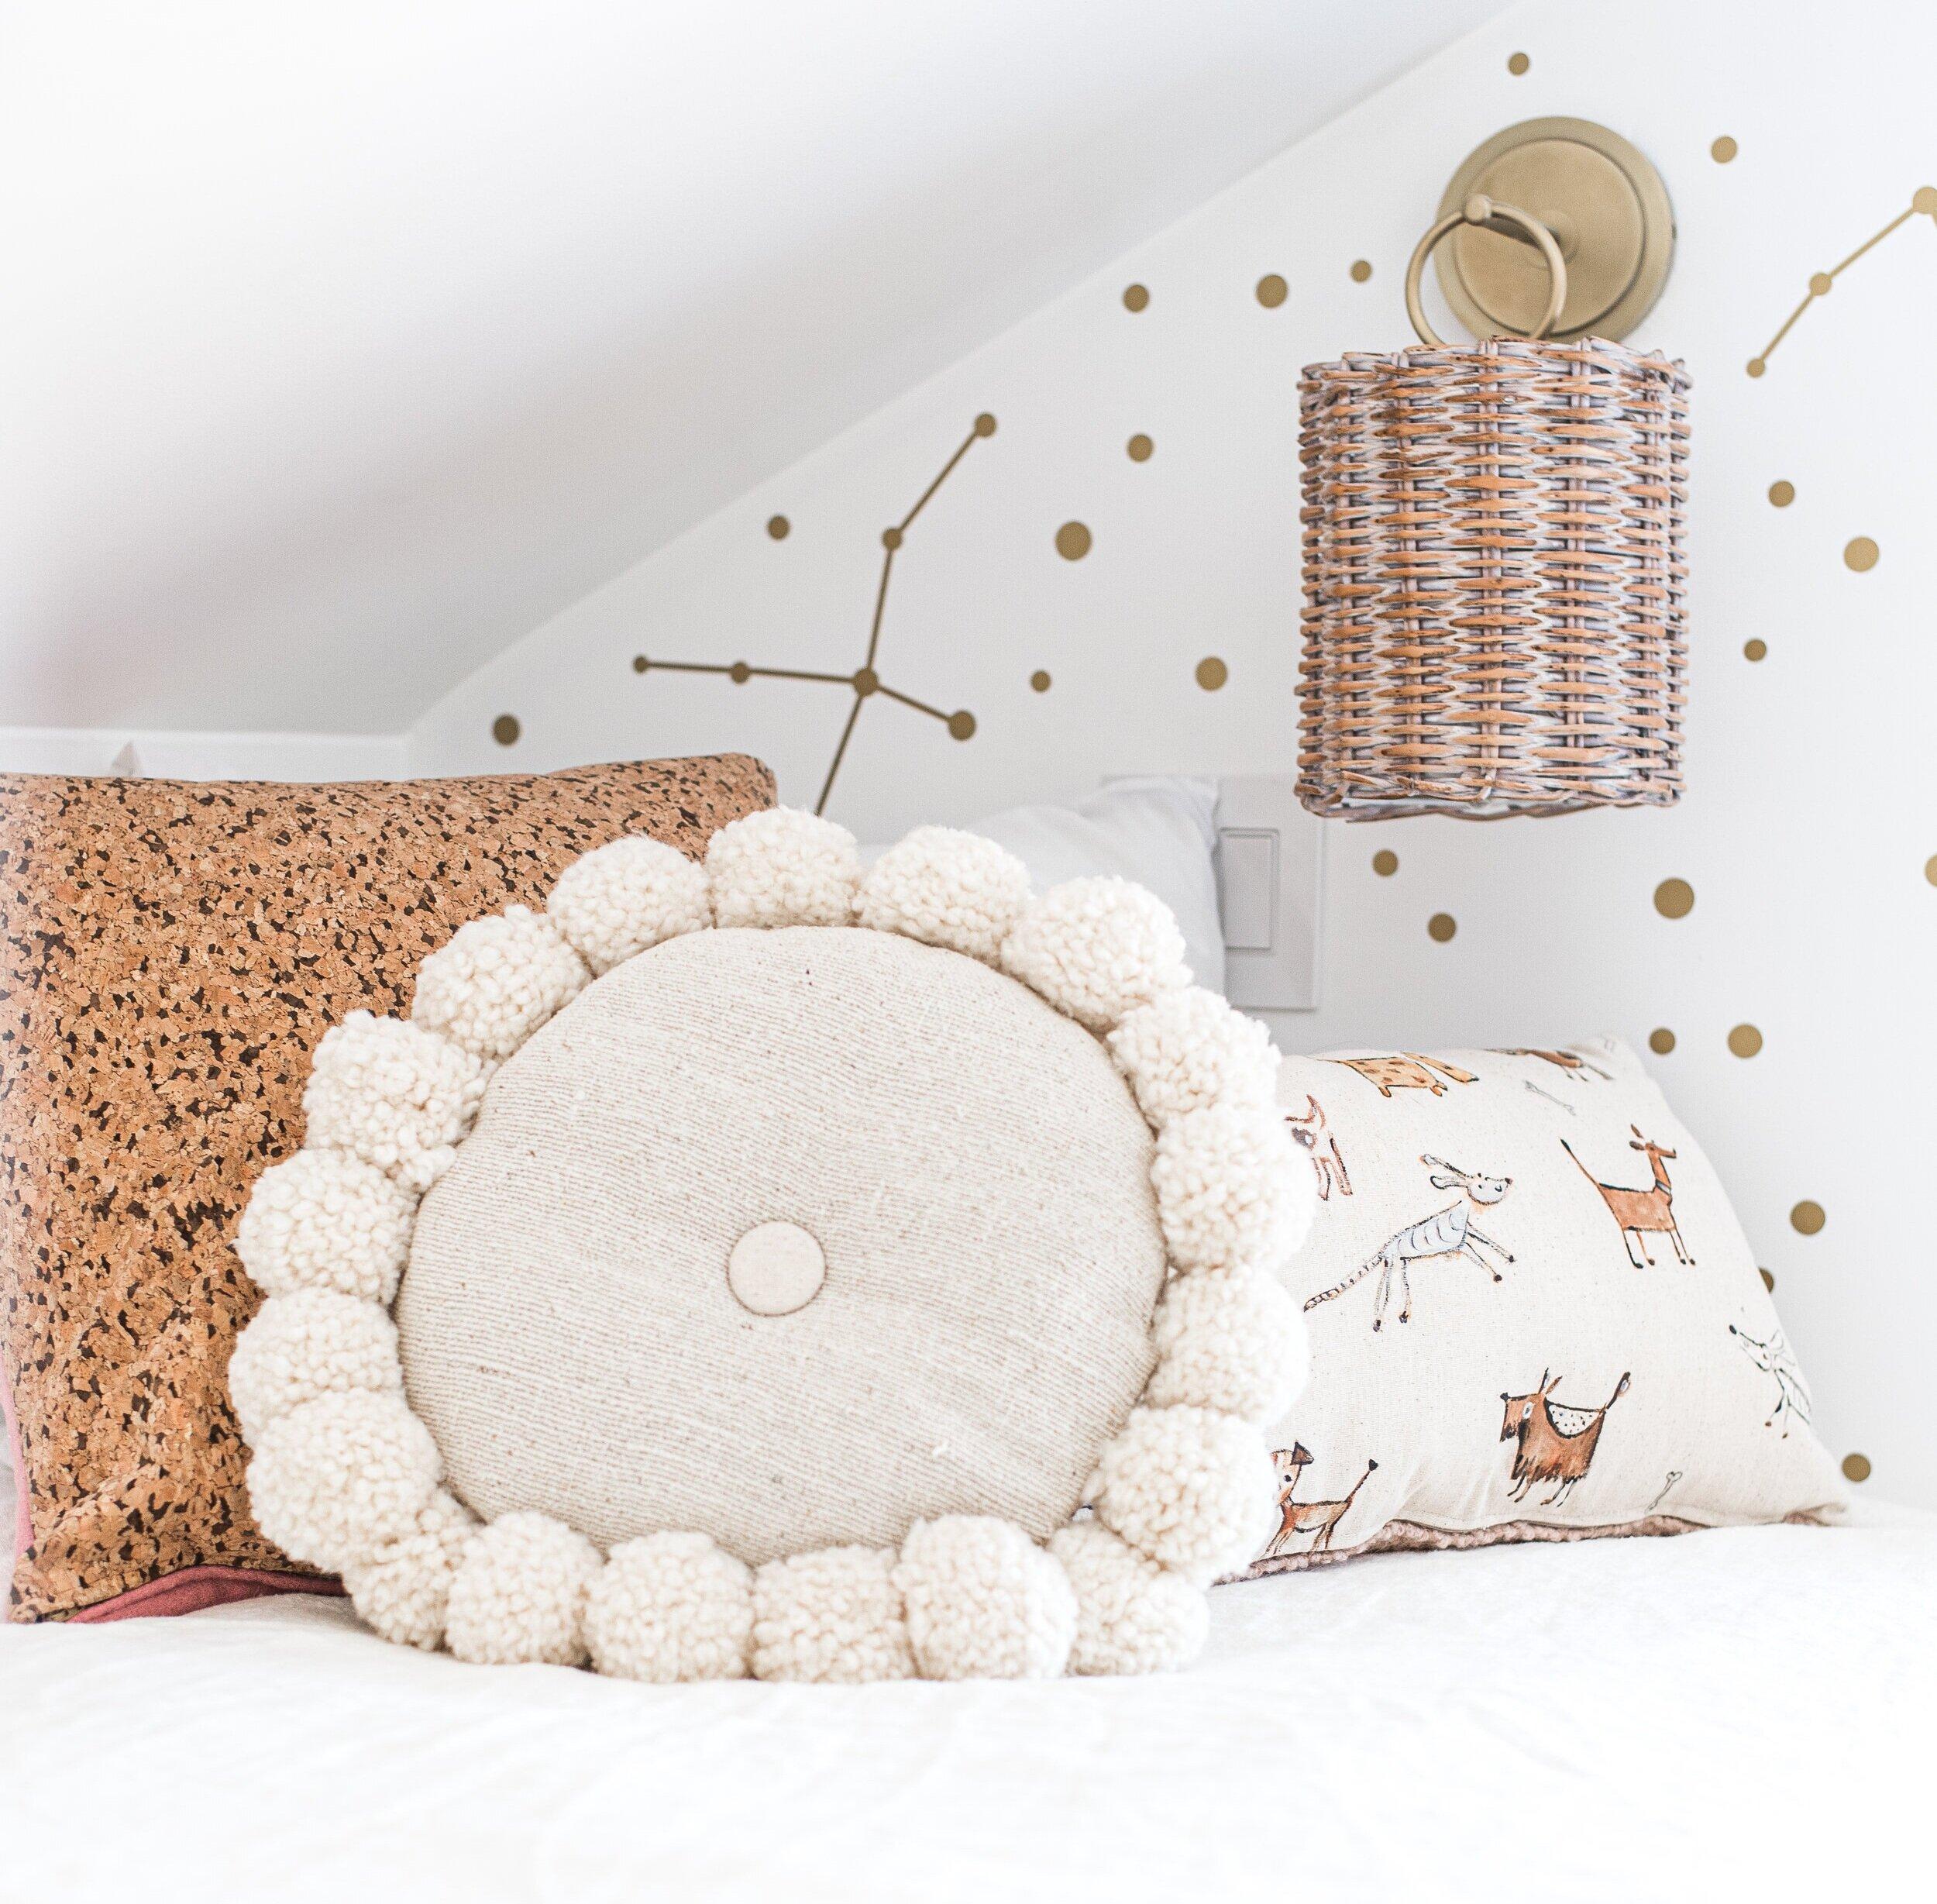 make round pillow with pom poms